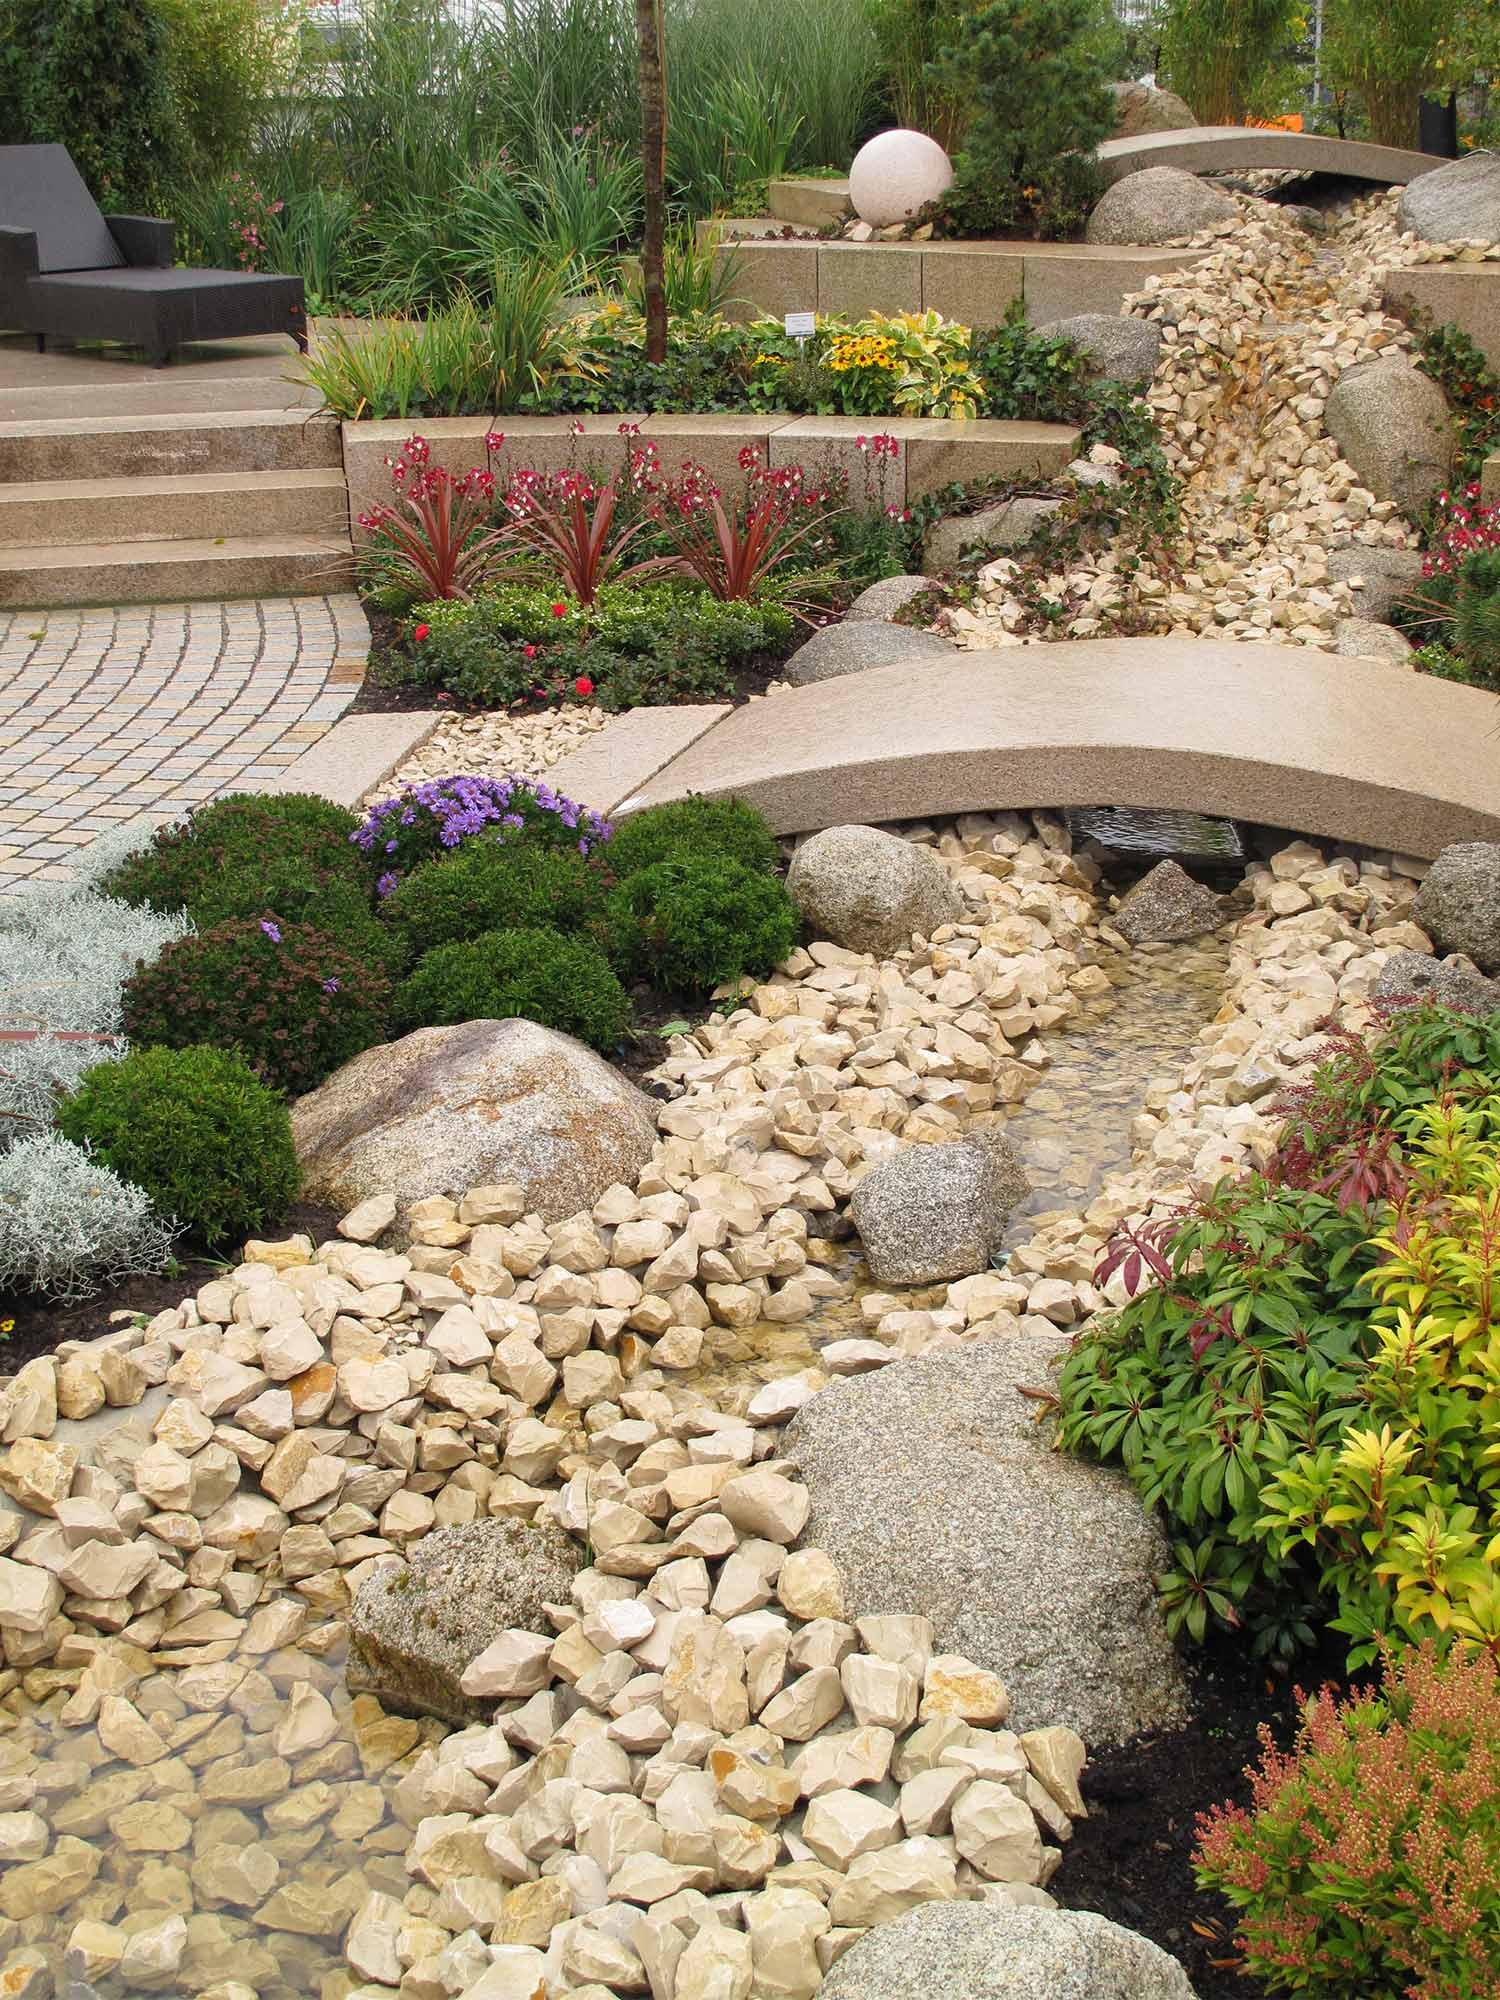 Pebble Garden Ideas - realestate.com.au on Backyard Pebble Ideas id=91092